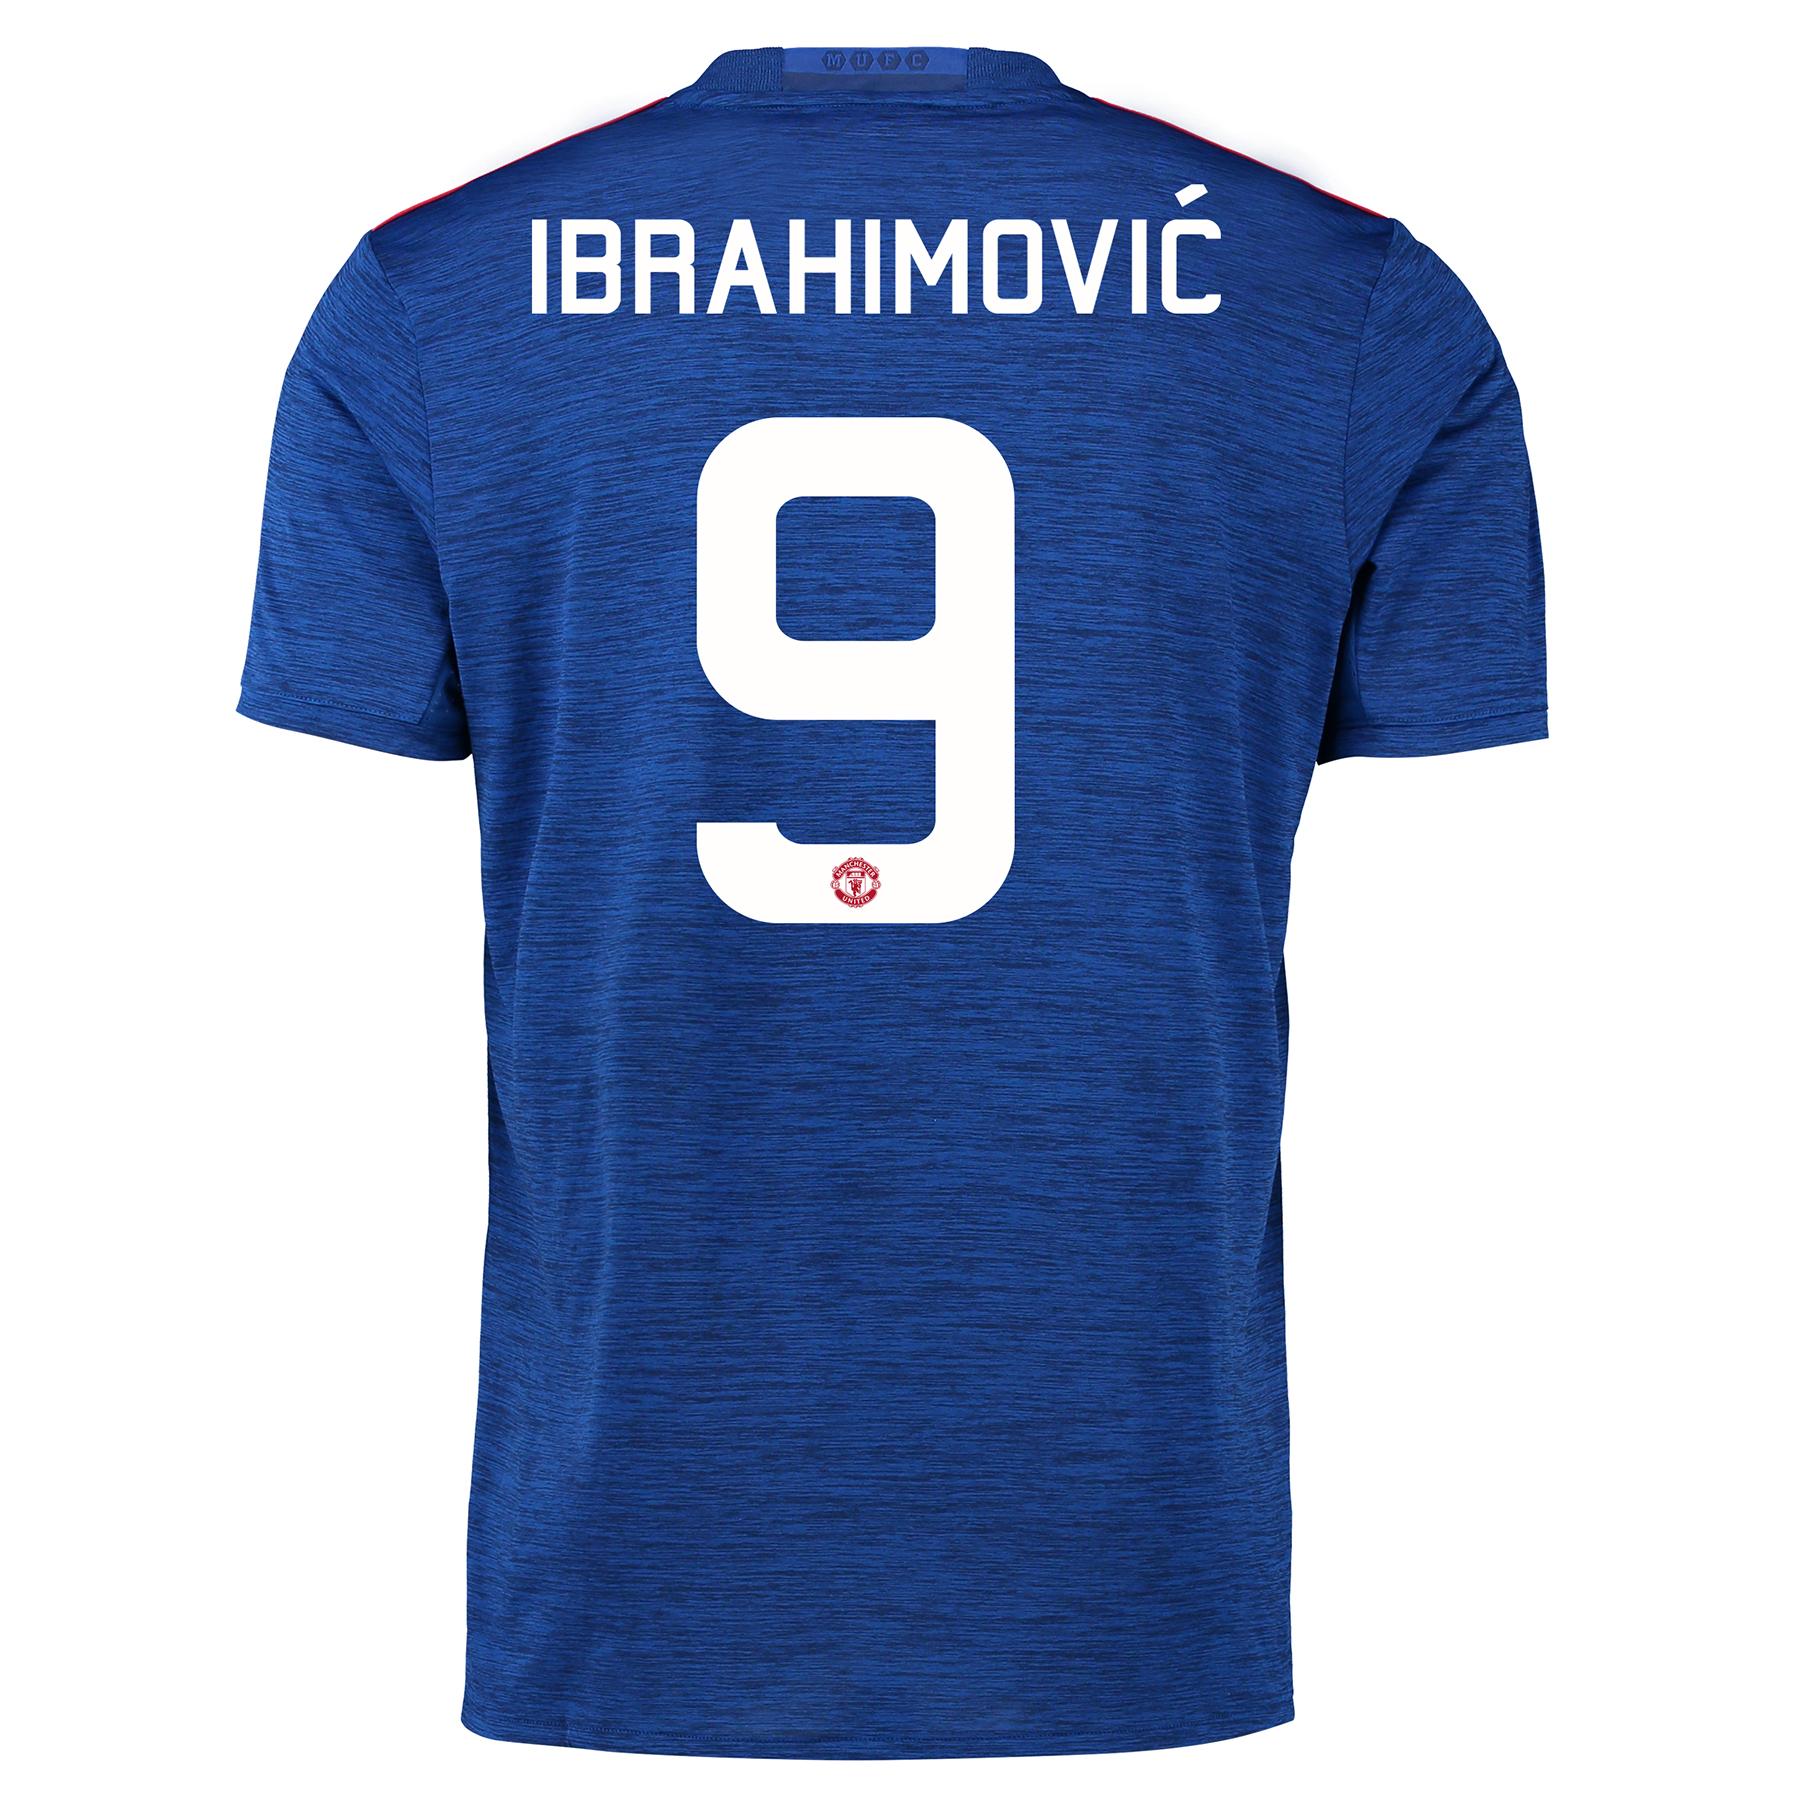 Manchester United Cup Away Shirt 2016-17 with Ibrahimovic 9 printing